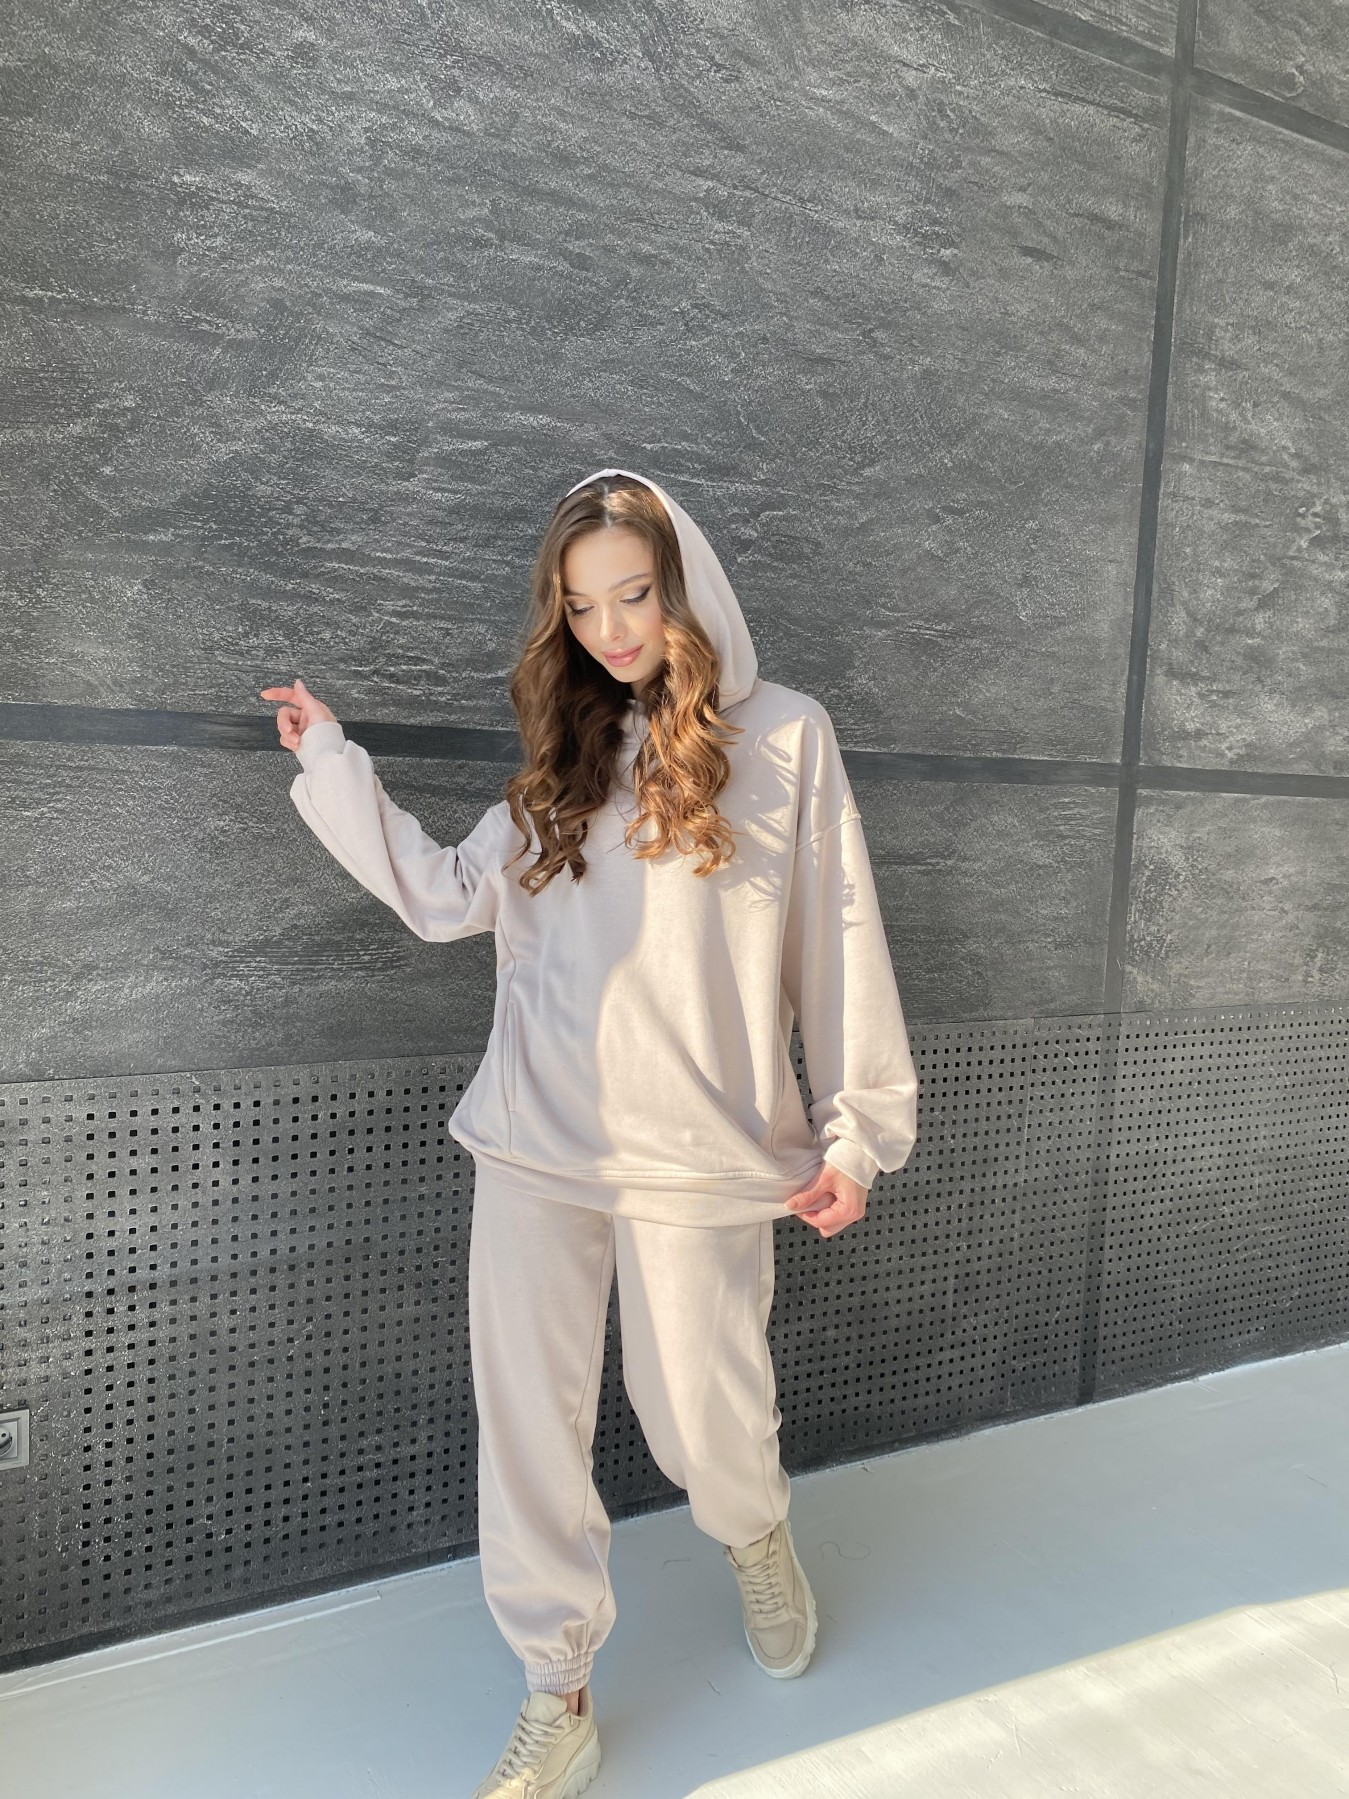 Марион костюм из 3х нитки 10581 АРТ. 46936 Цвет: Бежевый - фото 6, интернет магазин tm-modus.ru